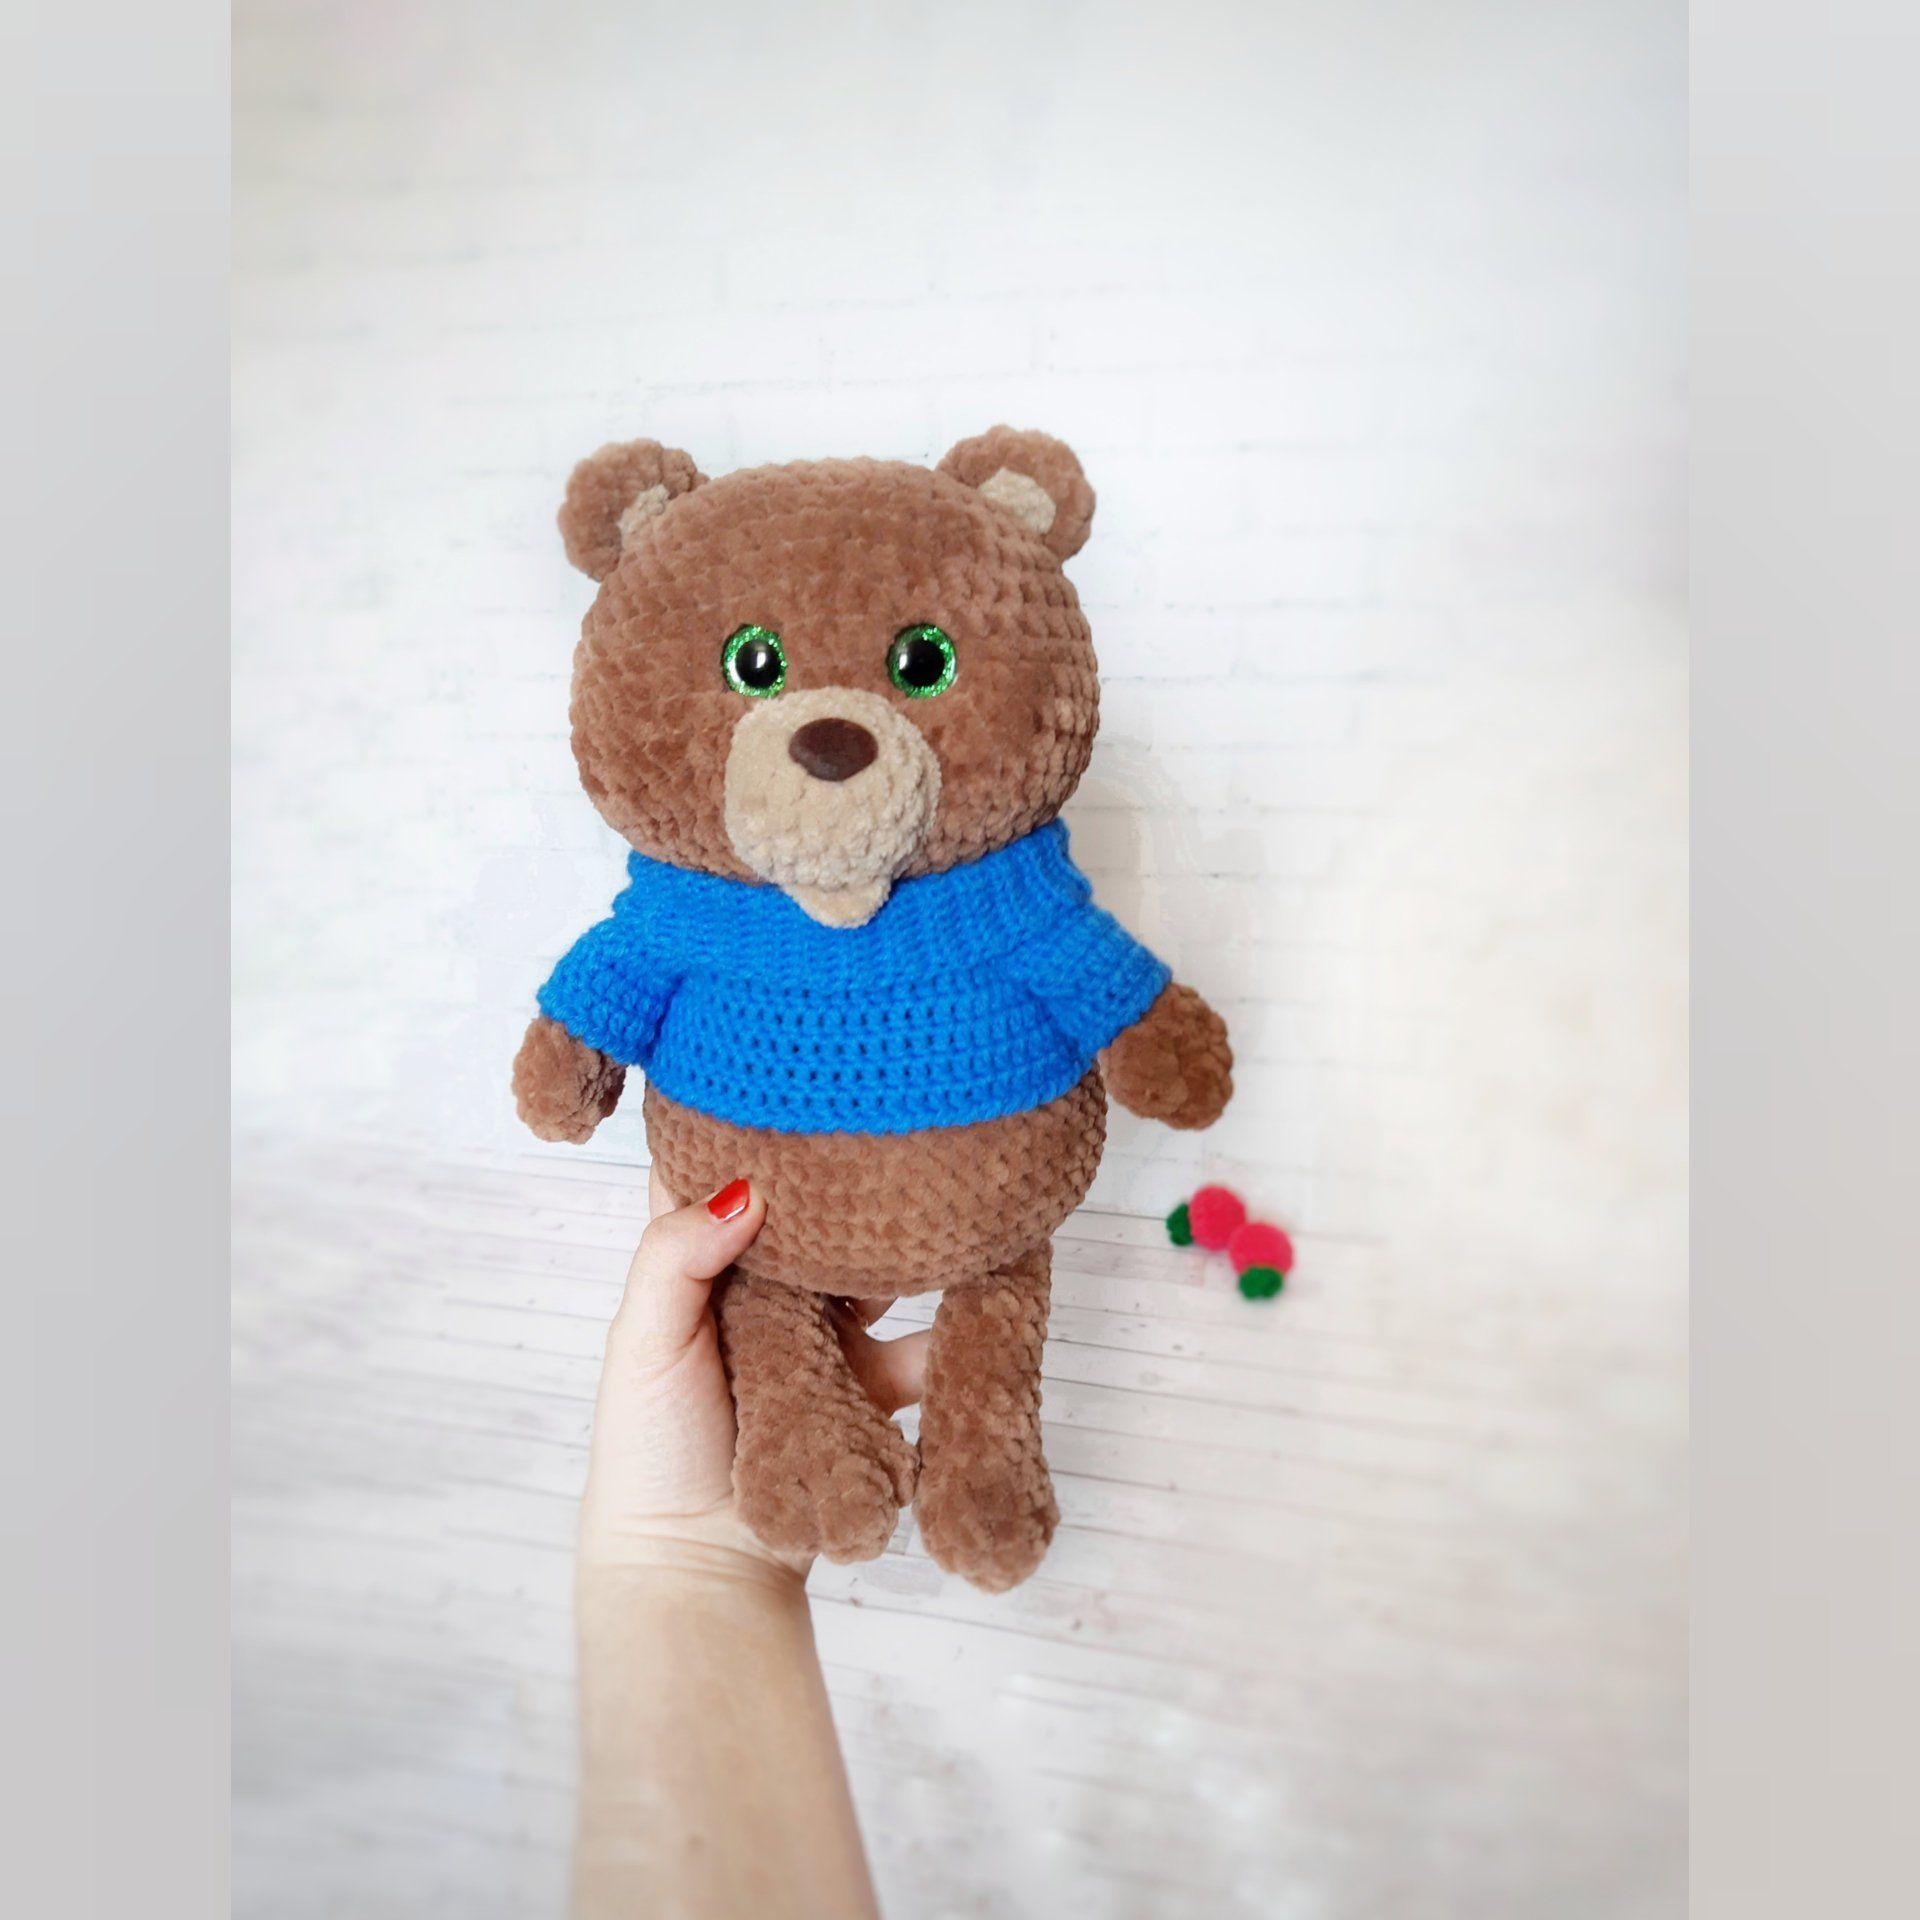 Crochet plush bear amigurumi | Amiguroom Toys | 1920x1920